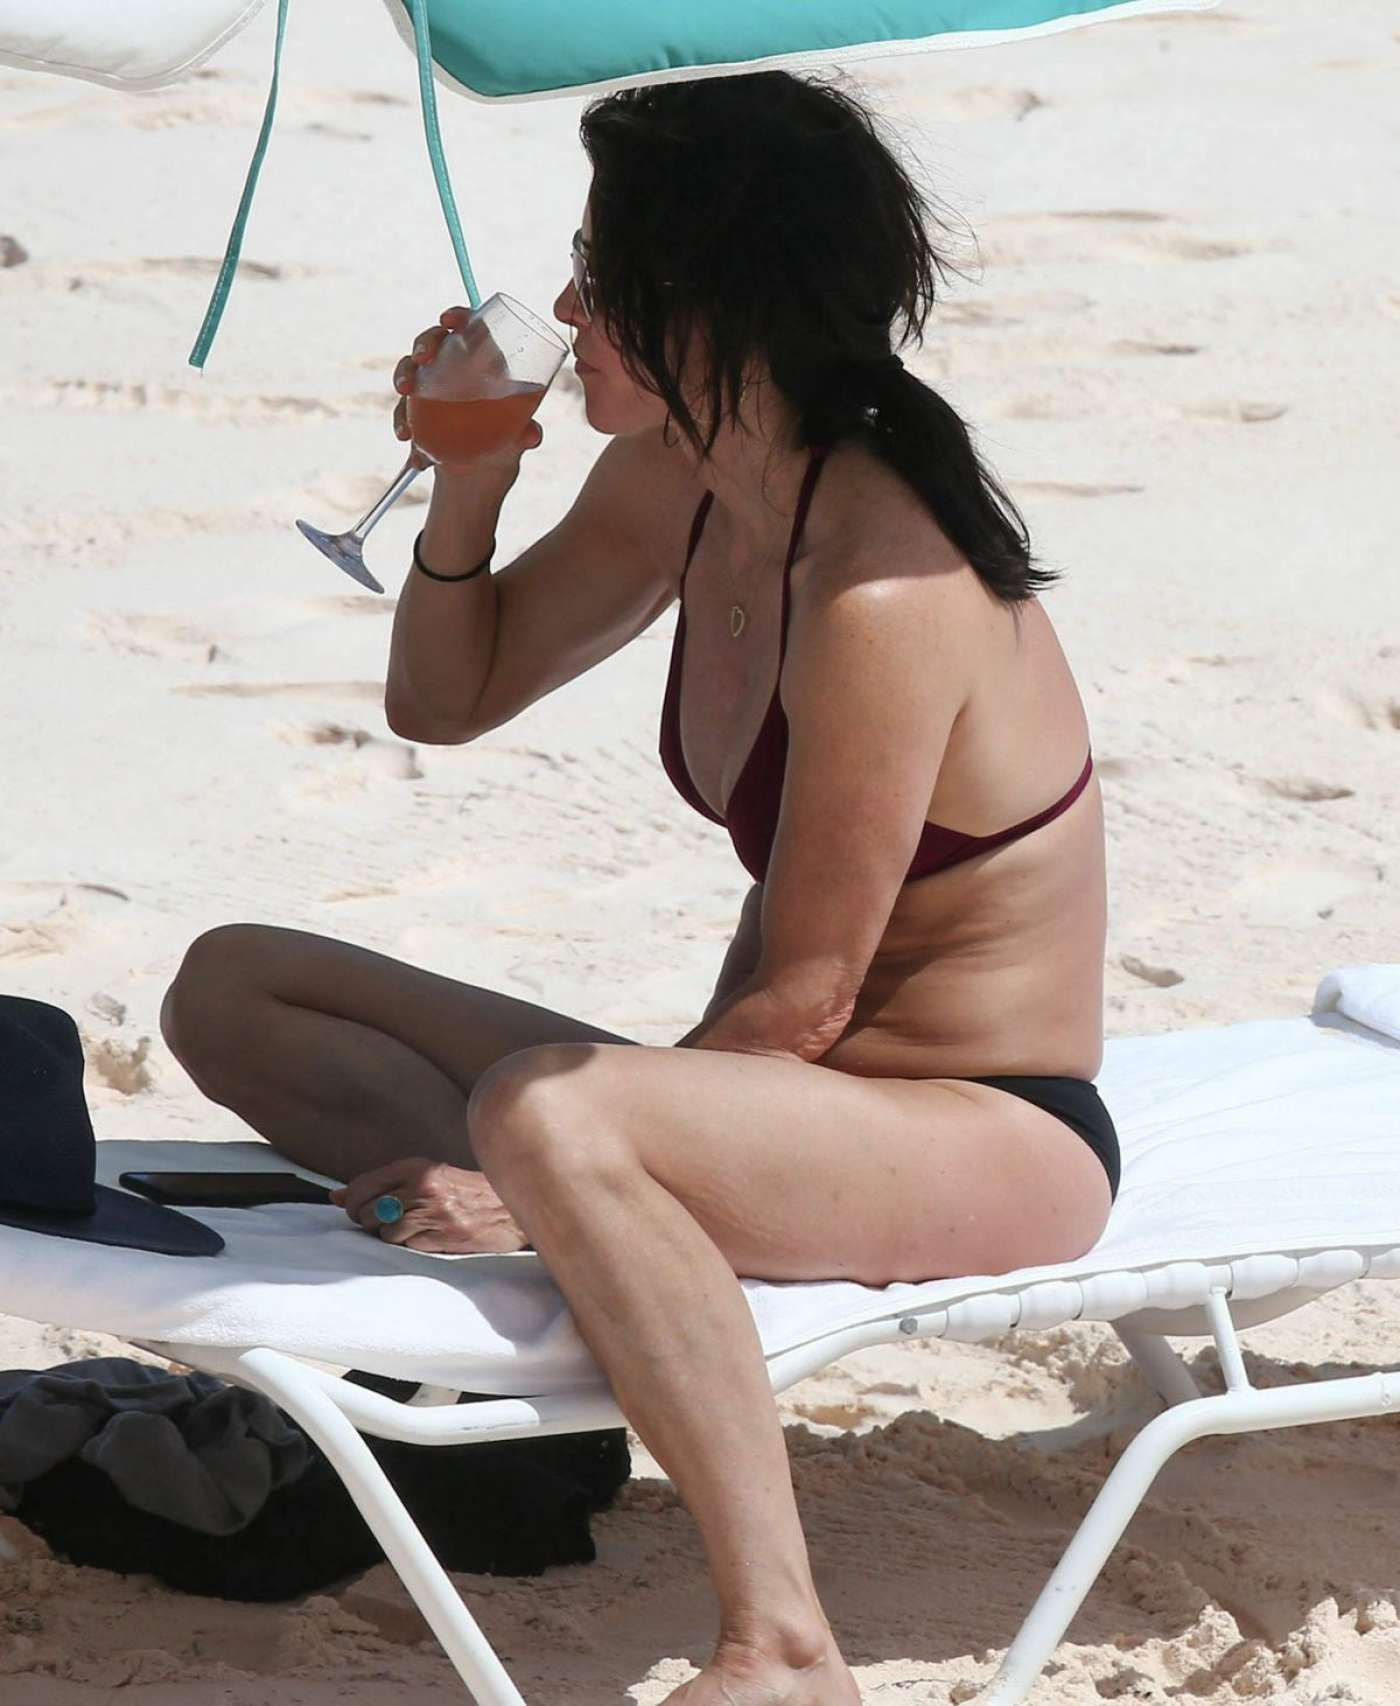 Eiza gonzalez bikini pool in honolulu - 4 2